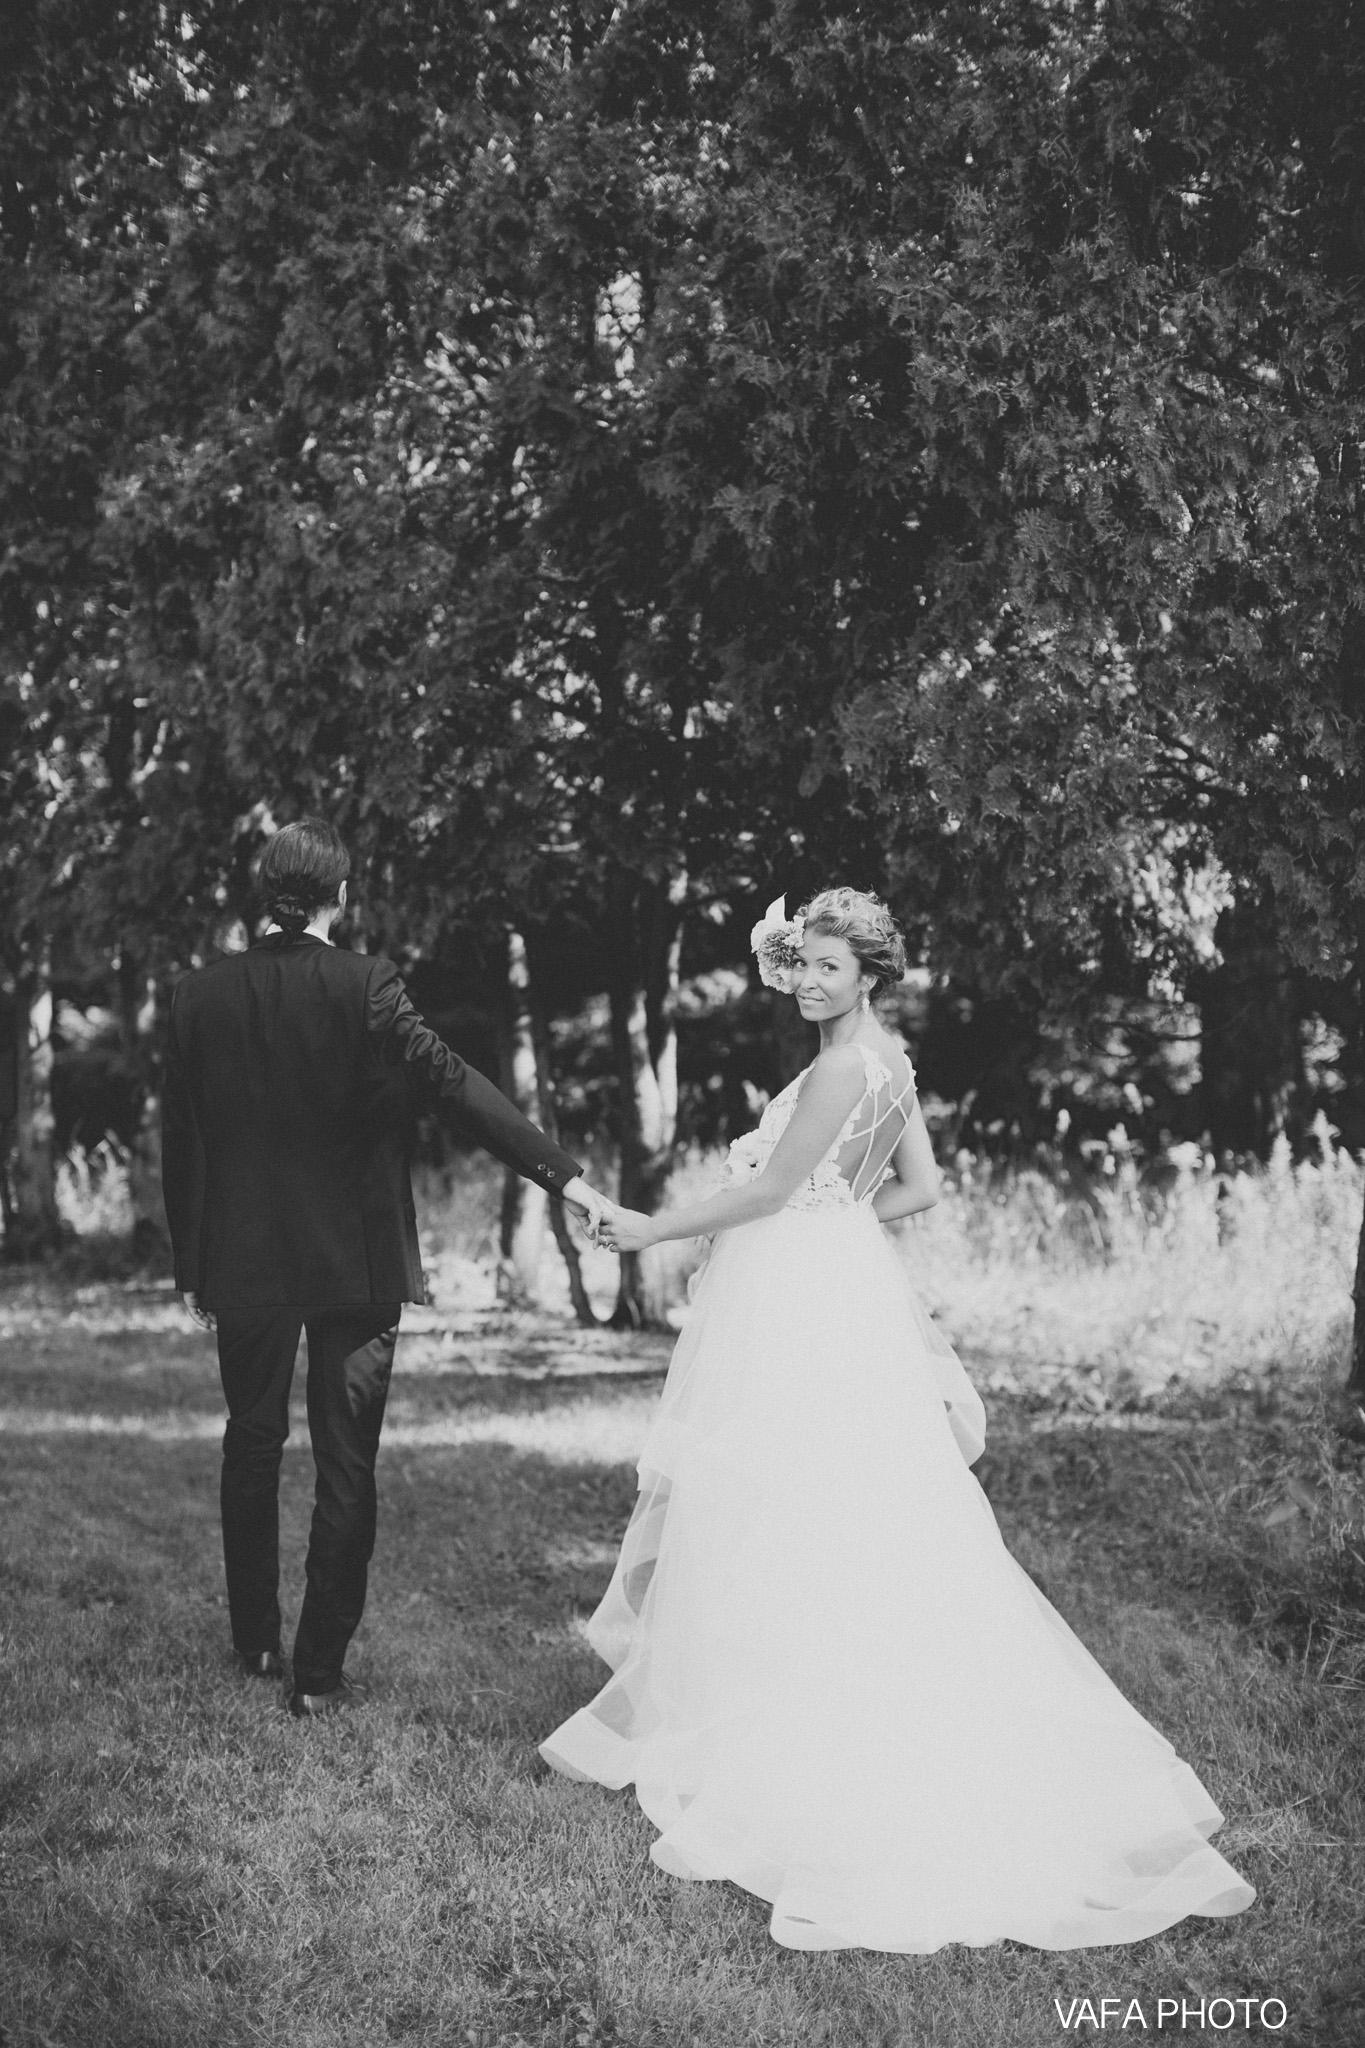 The-Felt-Estate-Wedding-Kailie-David-Vafa-Photo-624.jpg